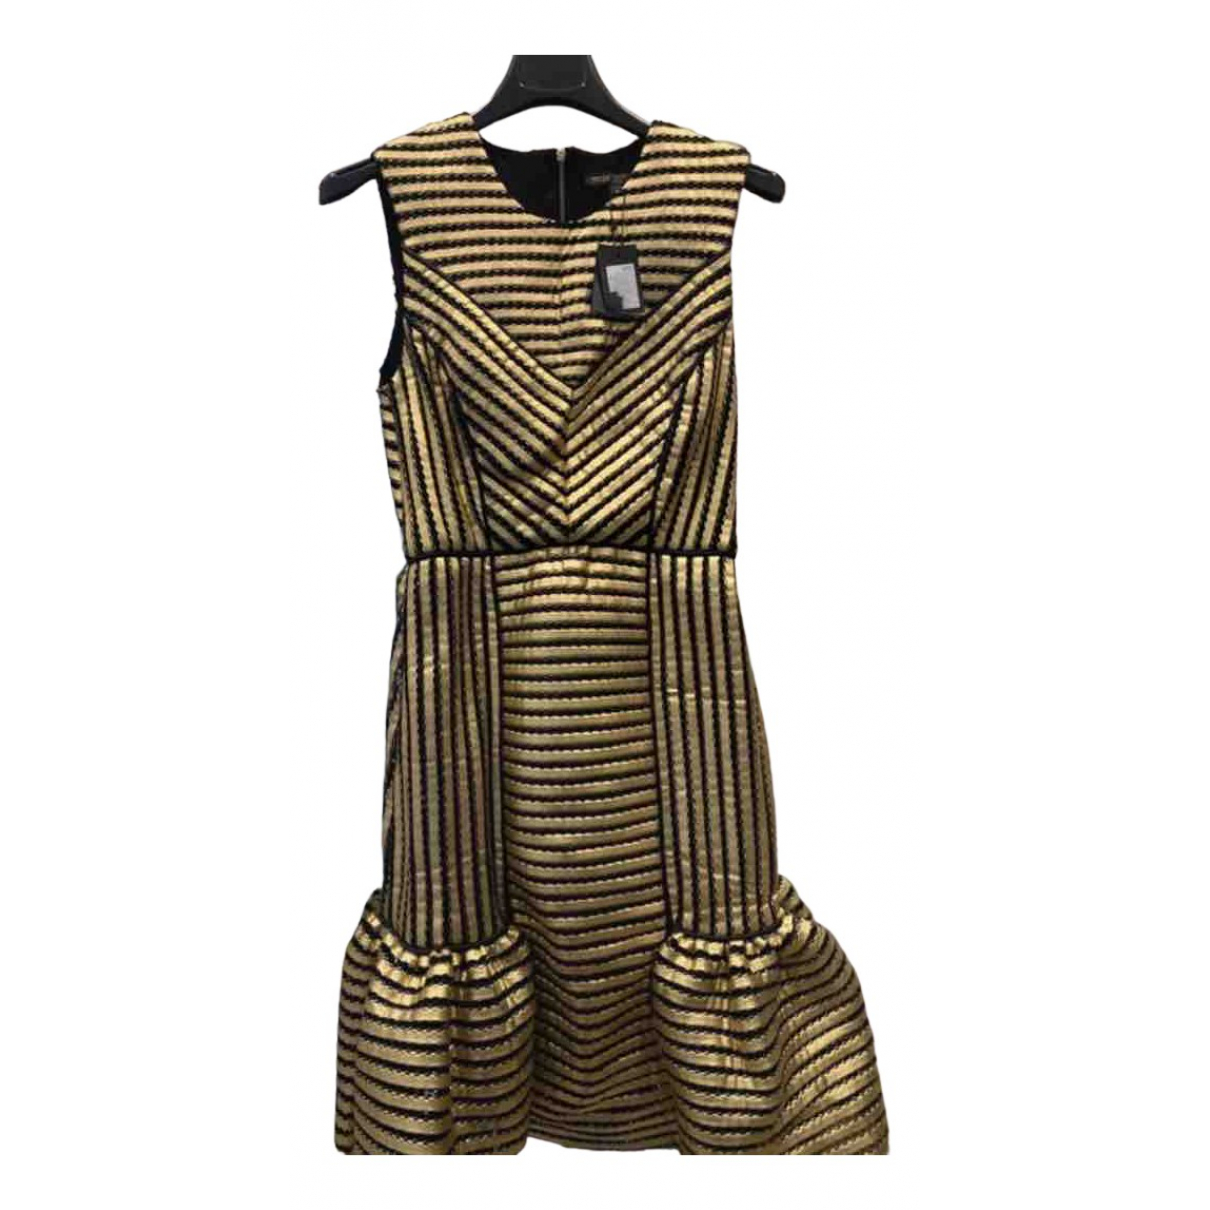 Maje N Black Cotton - elasthane dress for Women 36 FR